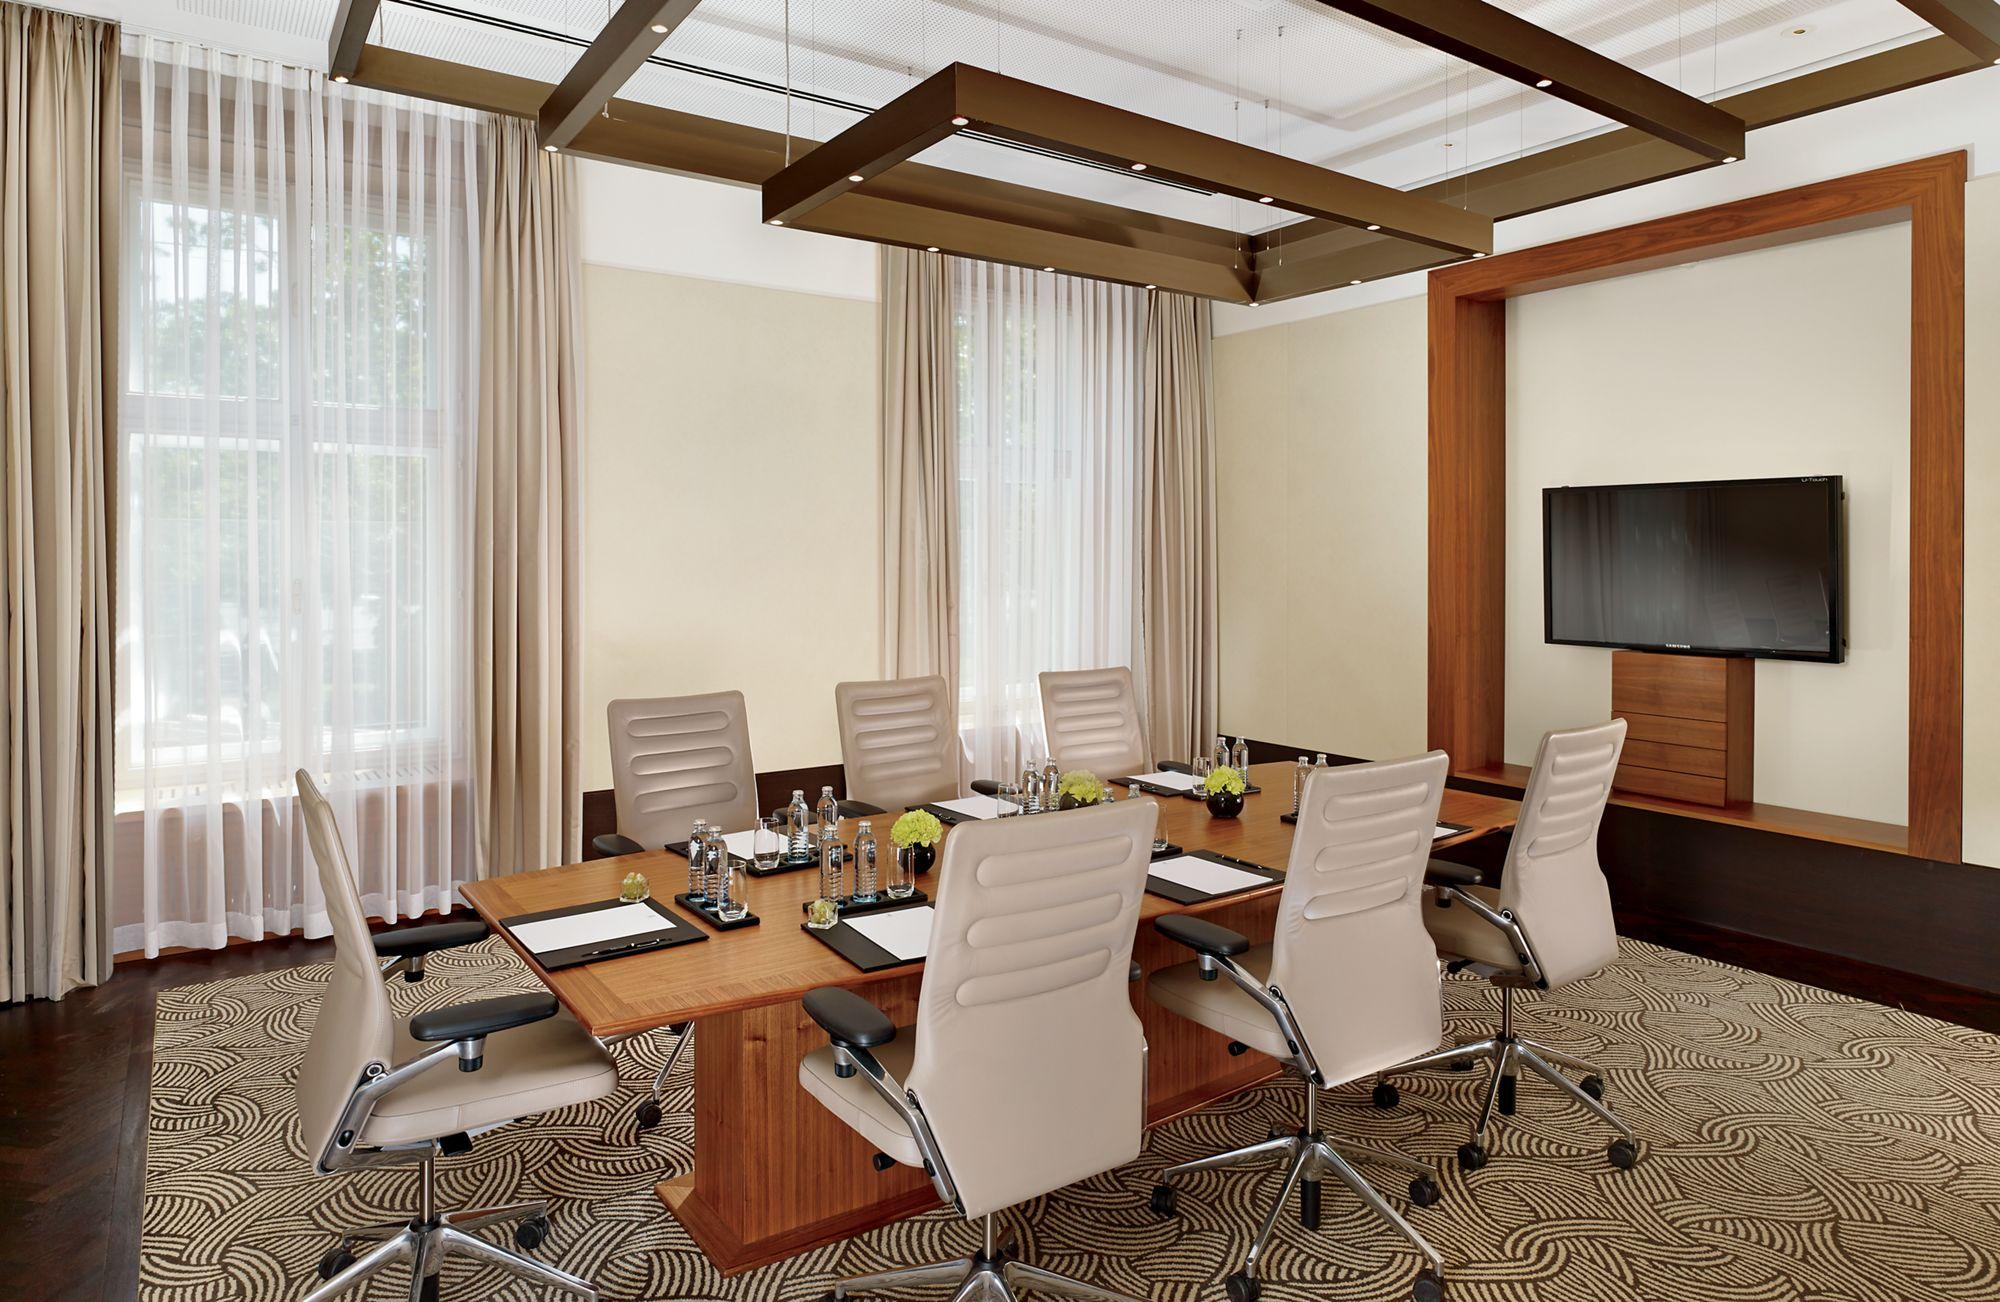 Room Seven Servies.Meeting Services Vienna Vienna Meeting Facilities The